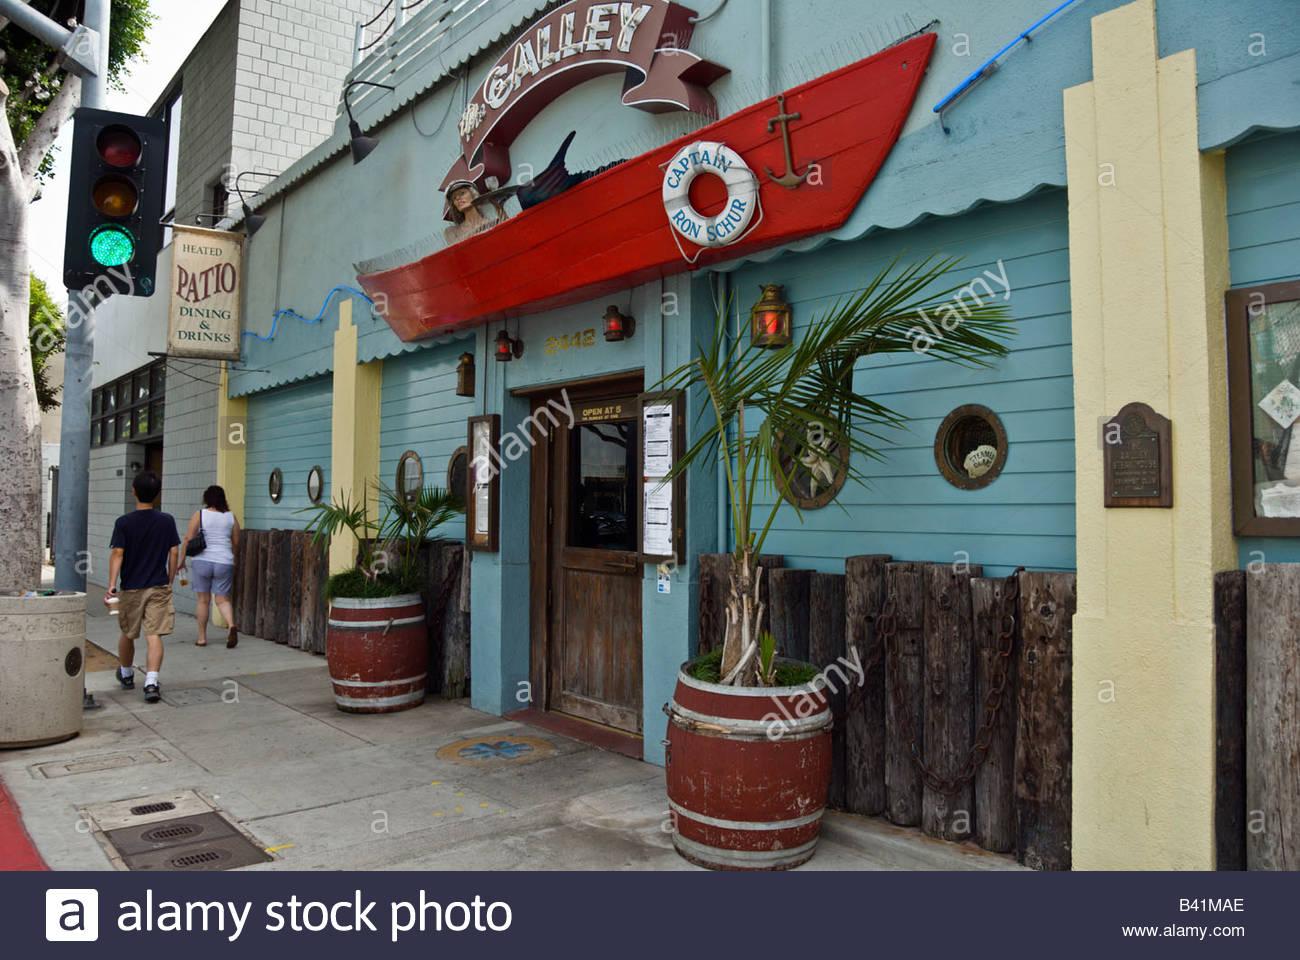 the galley restaurant & bar - santa monica los angeles, california